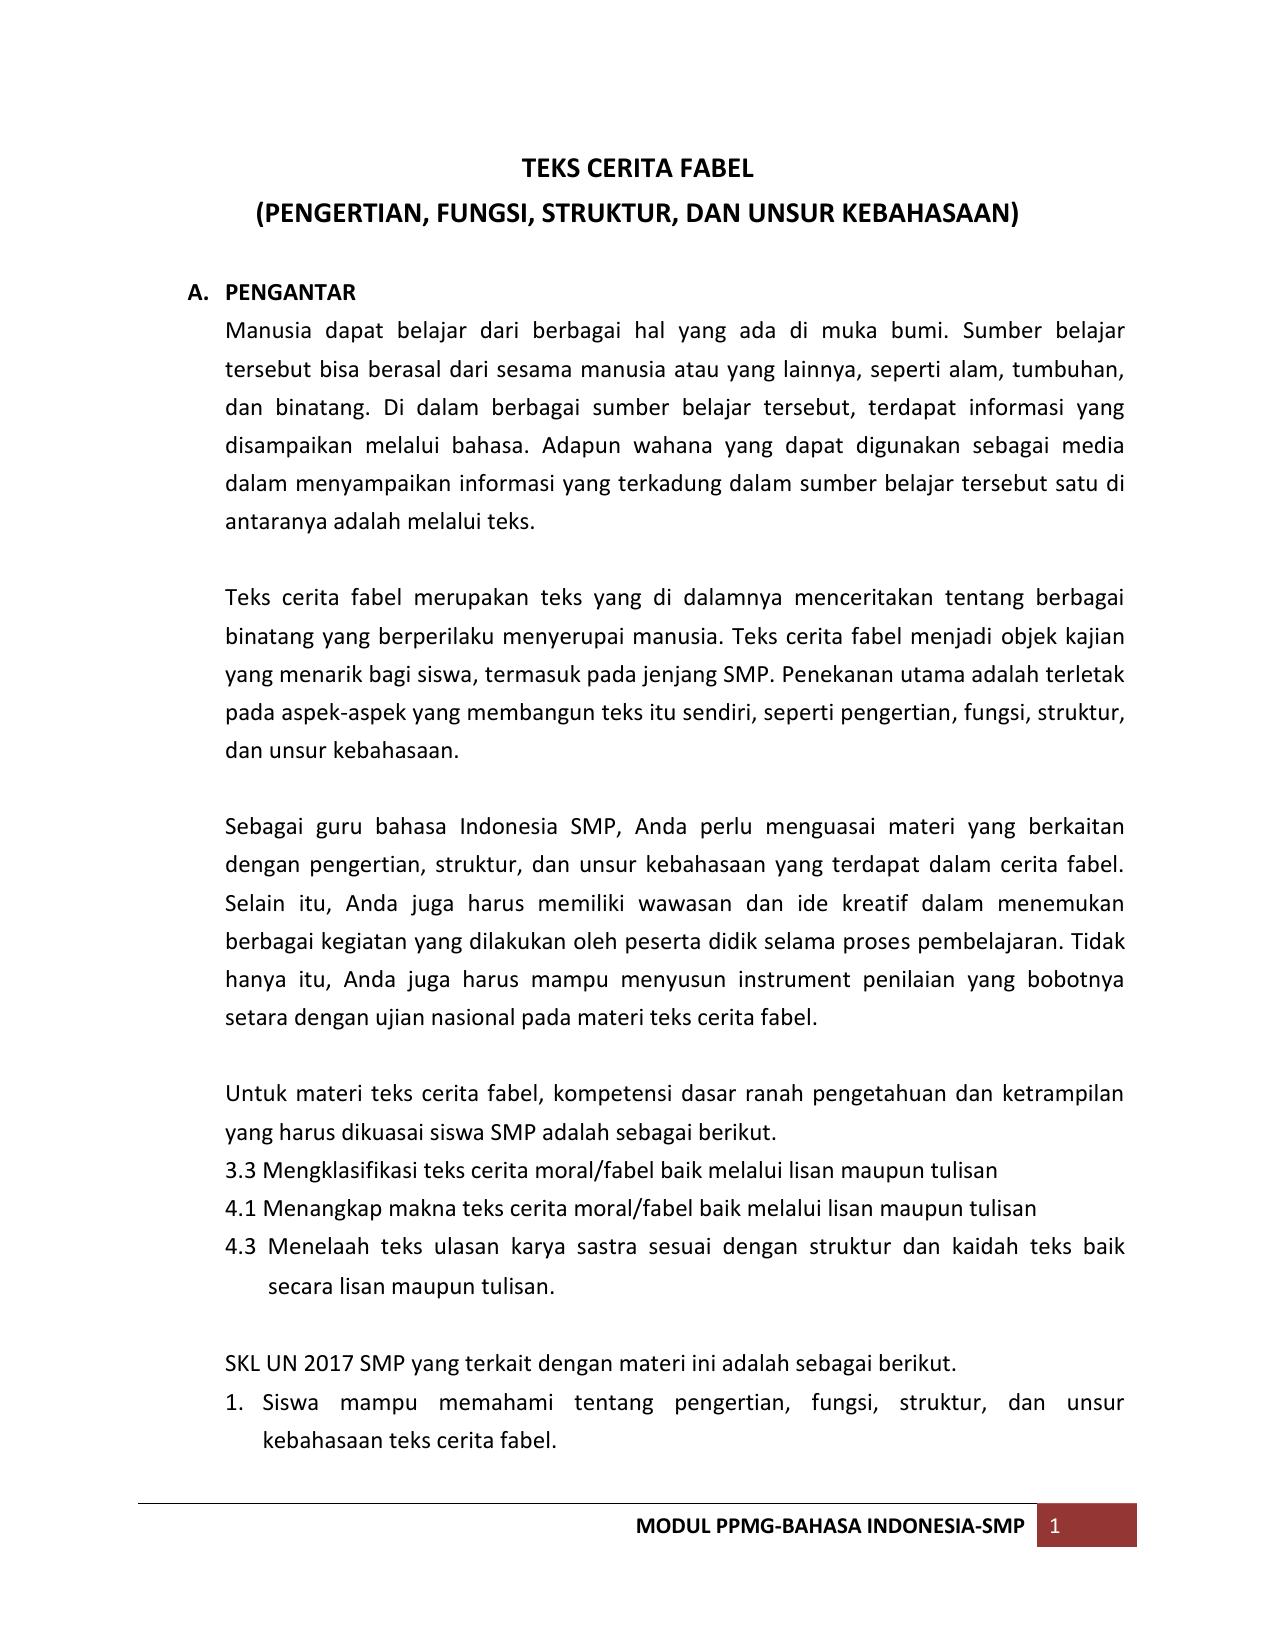 5 Modul Ppmg Teks Fabel Dispendik Ketenagaan Surabaya